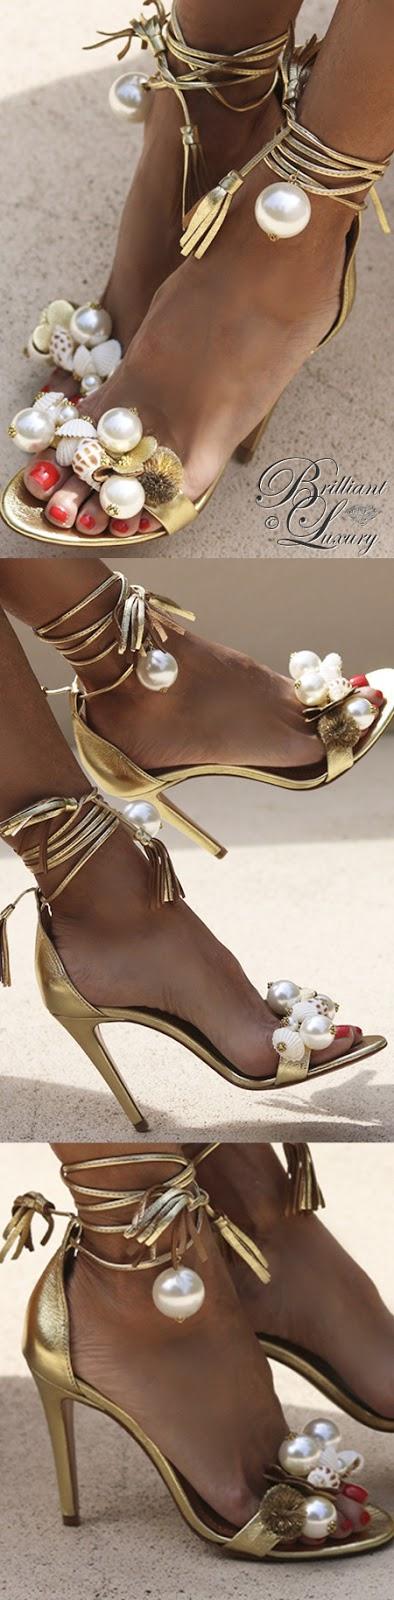 Brilliant Luxury ♦ Alameda Turquesa Dona Ana sandals